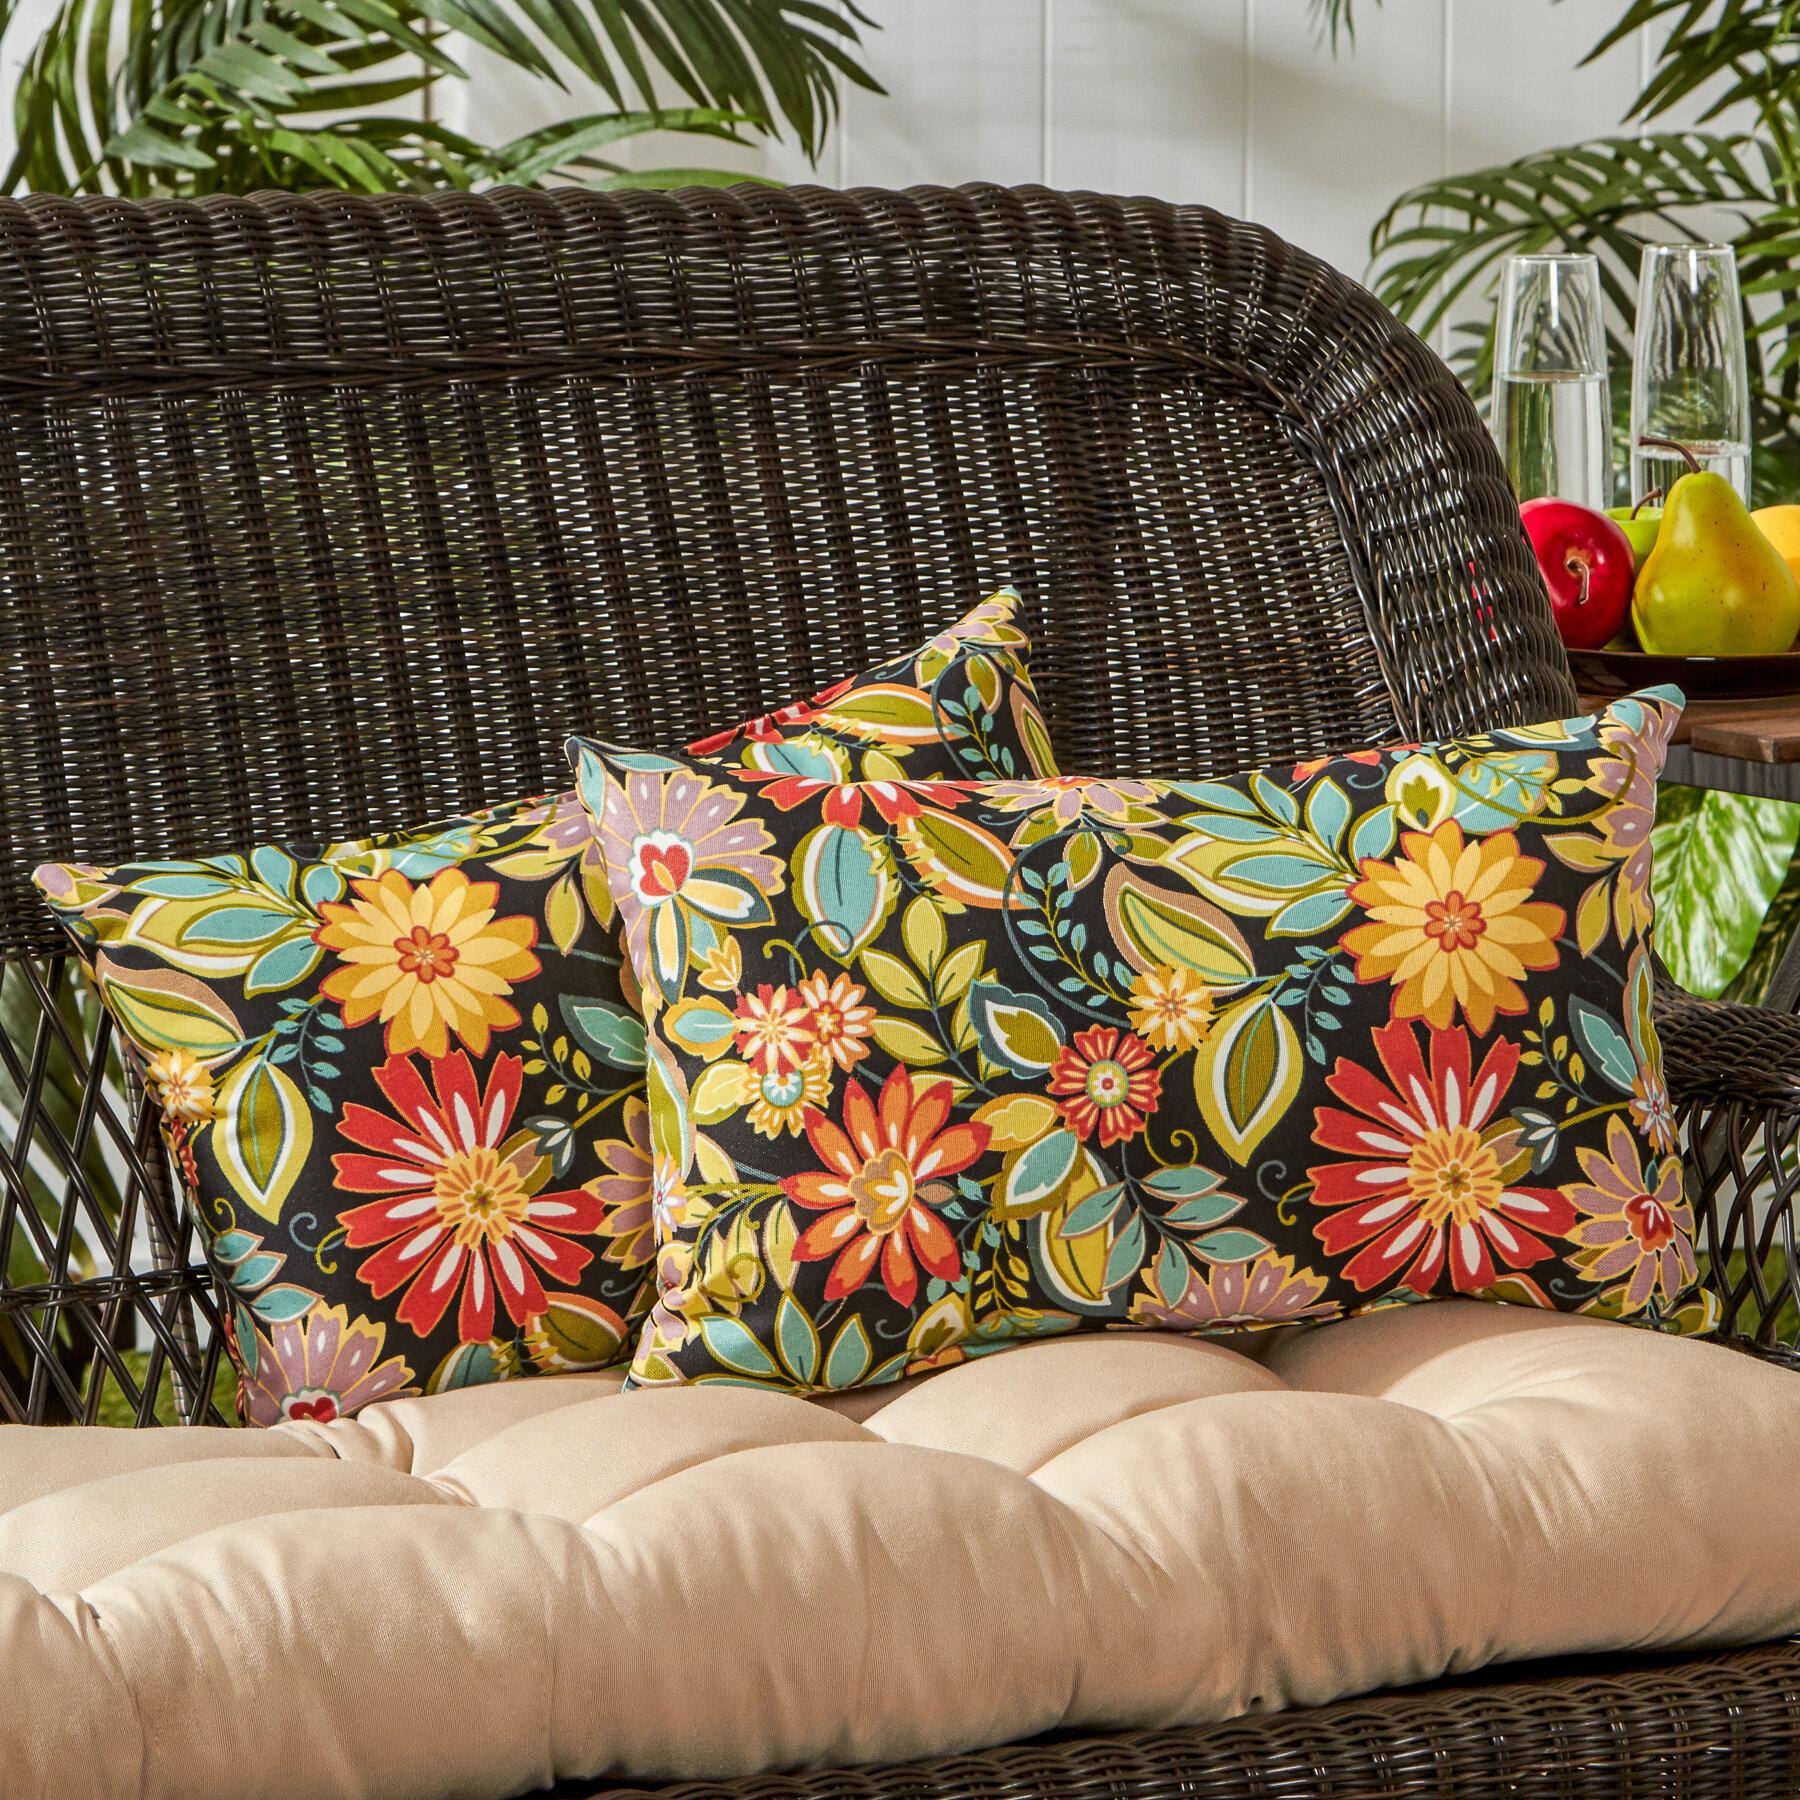 Greendale Home Fashions Outdoor Lumbar Pillow Reviews Wayfair